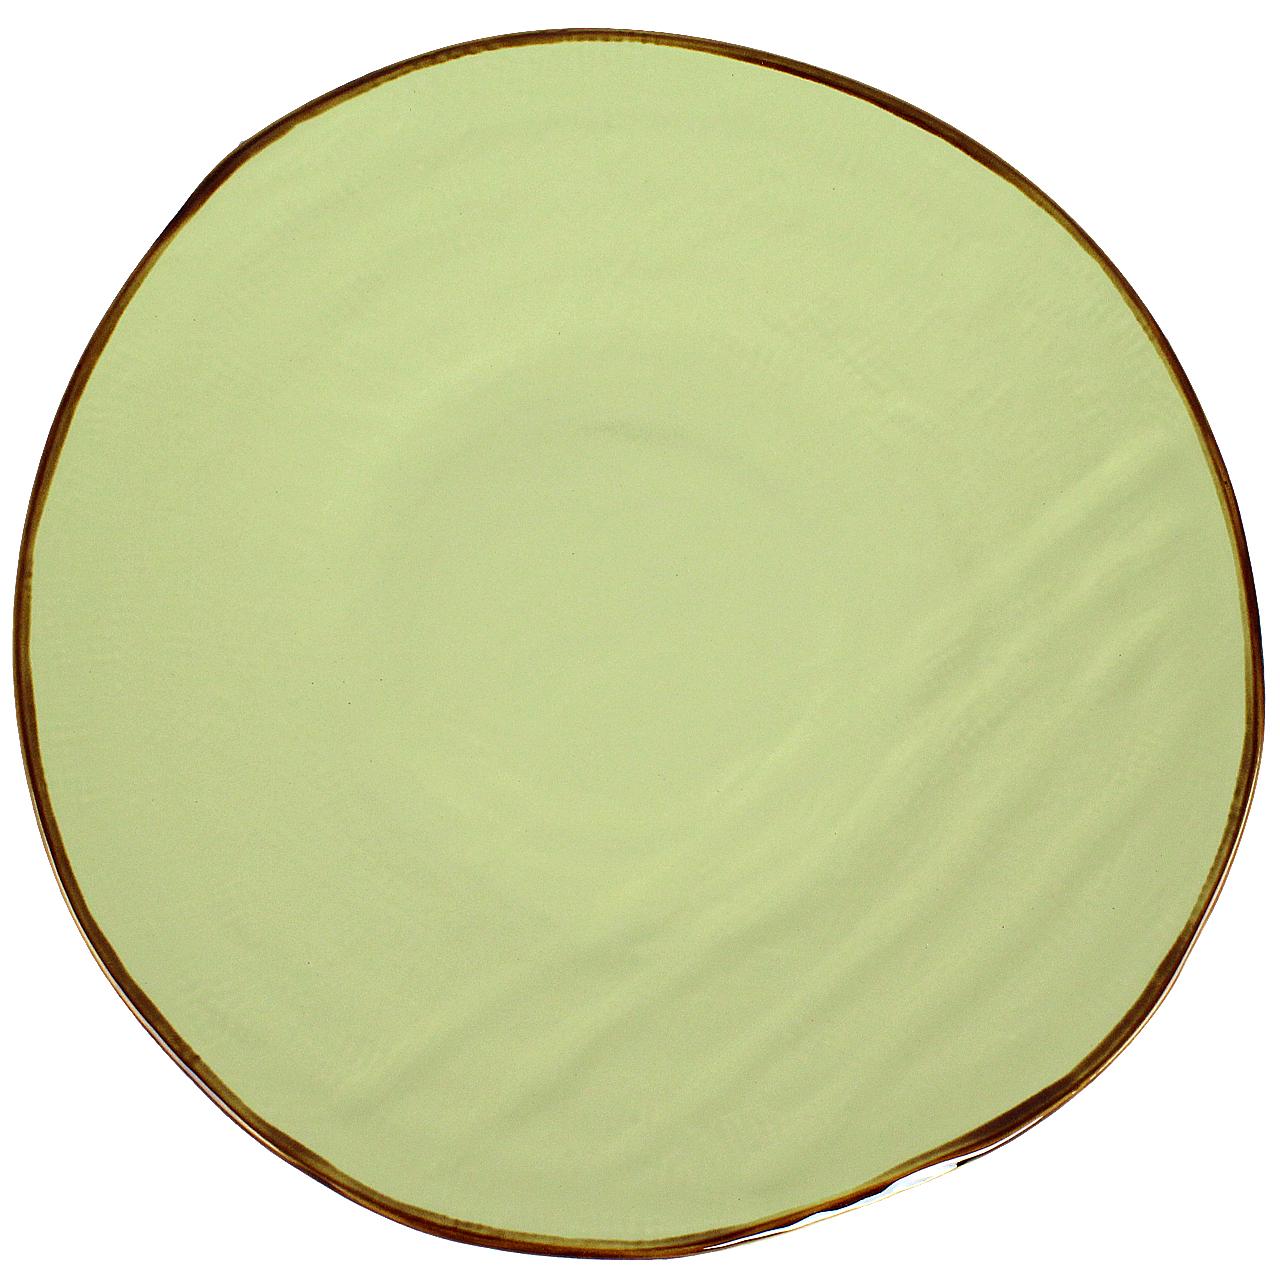 Farfurie Intinsa Din Ceramica Verde